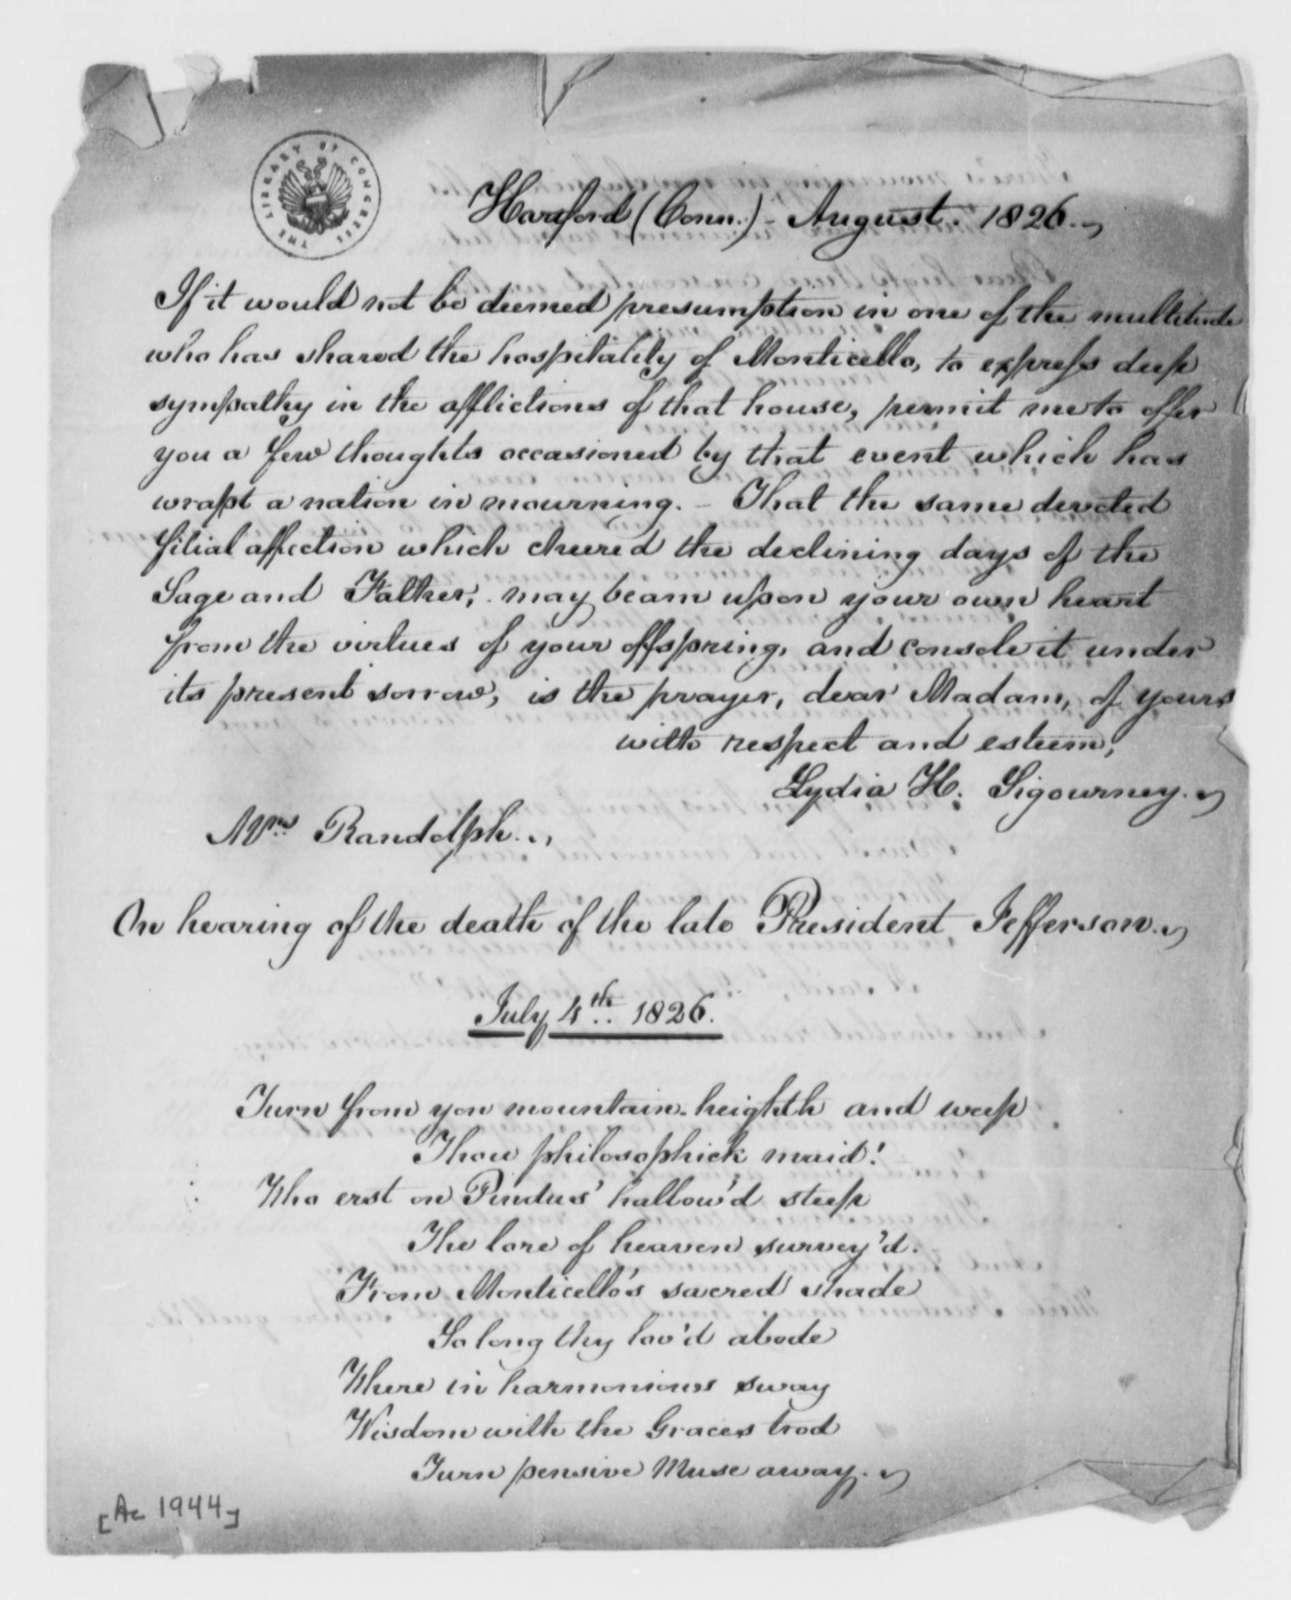 Lydia H. Sigourney to Martha Randolph, August 1826, with Poem